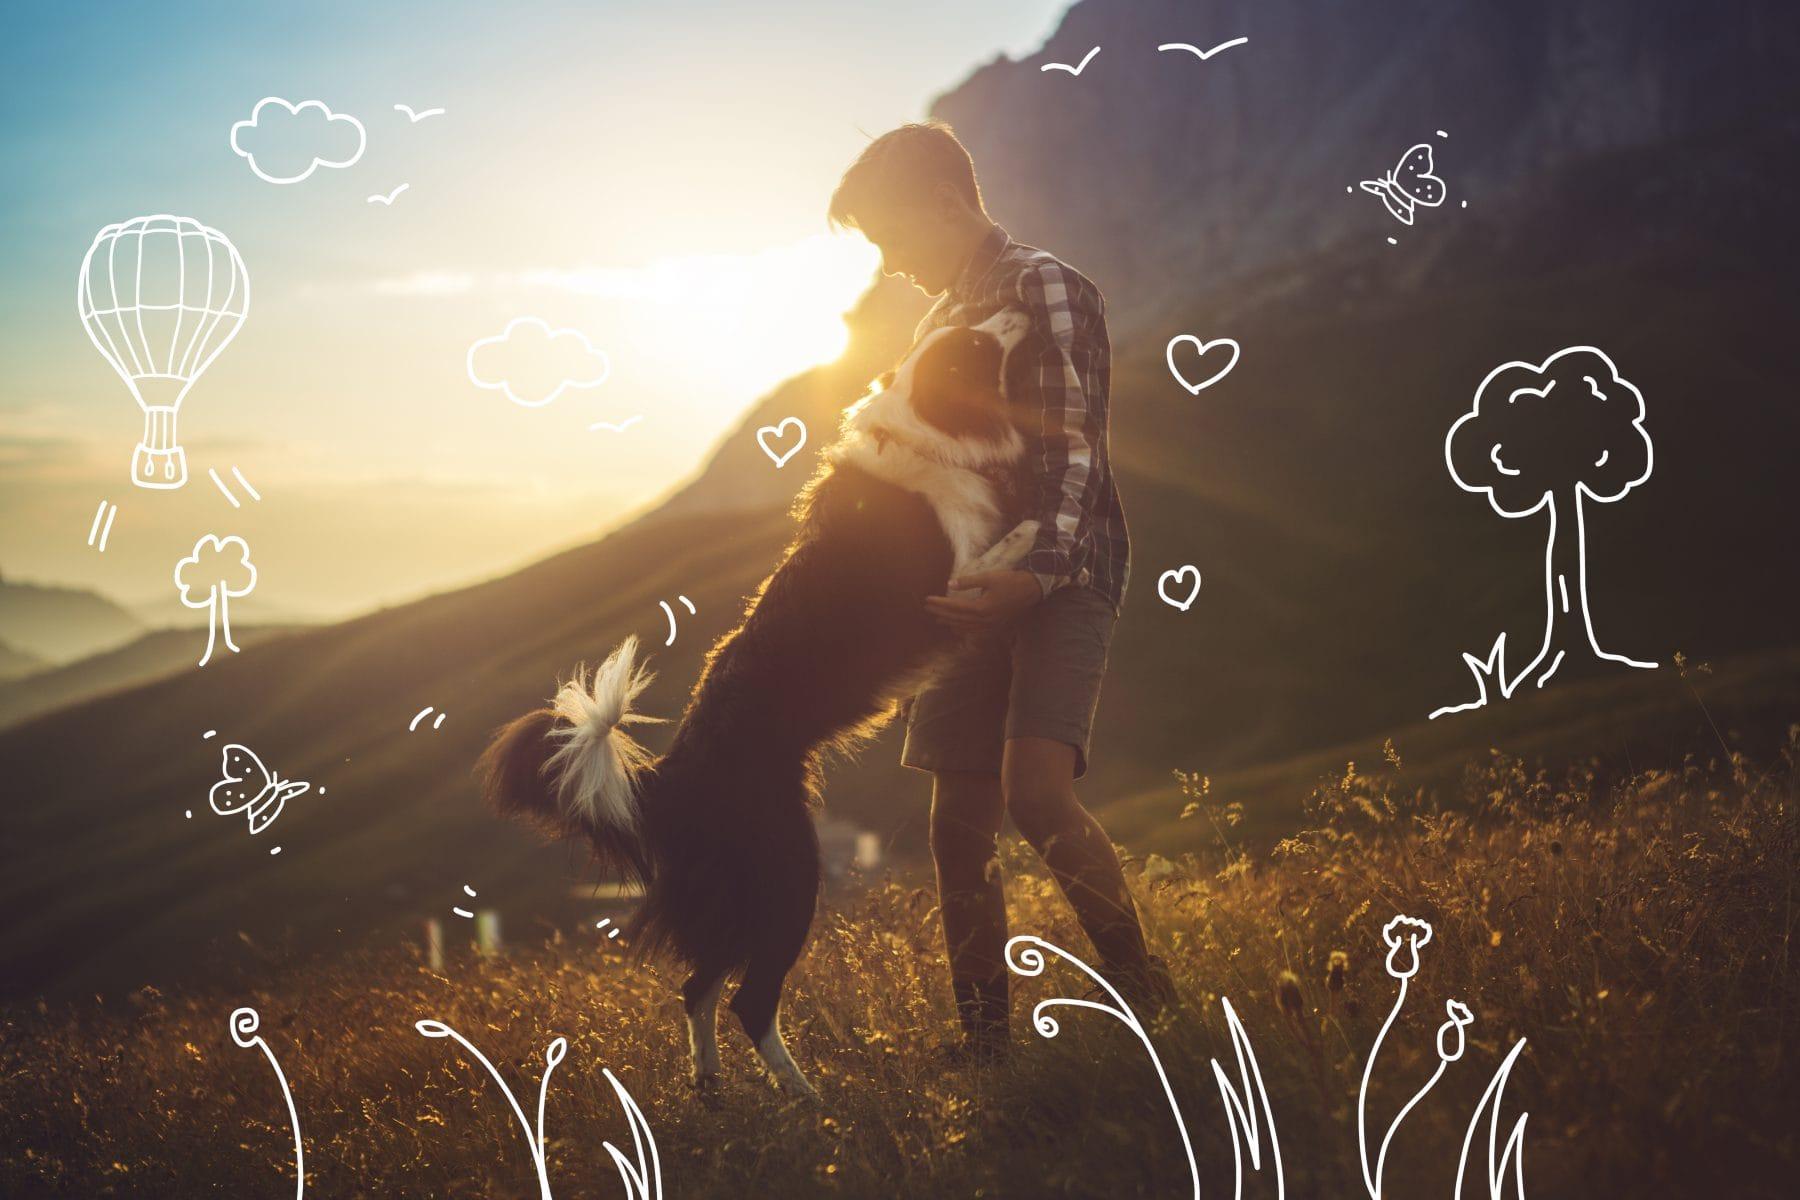 Border collies - pet insurance, dog insurance, Border Collie Insurance